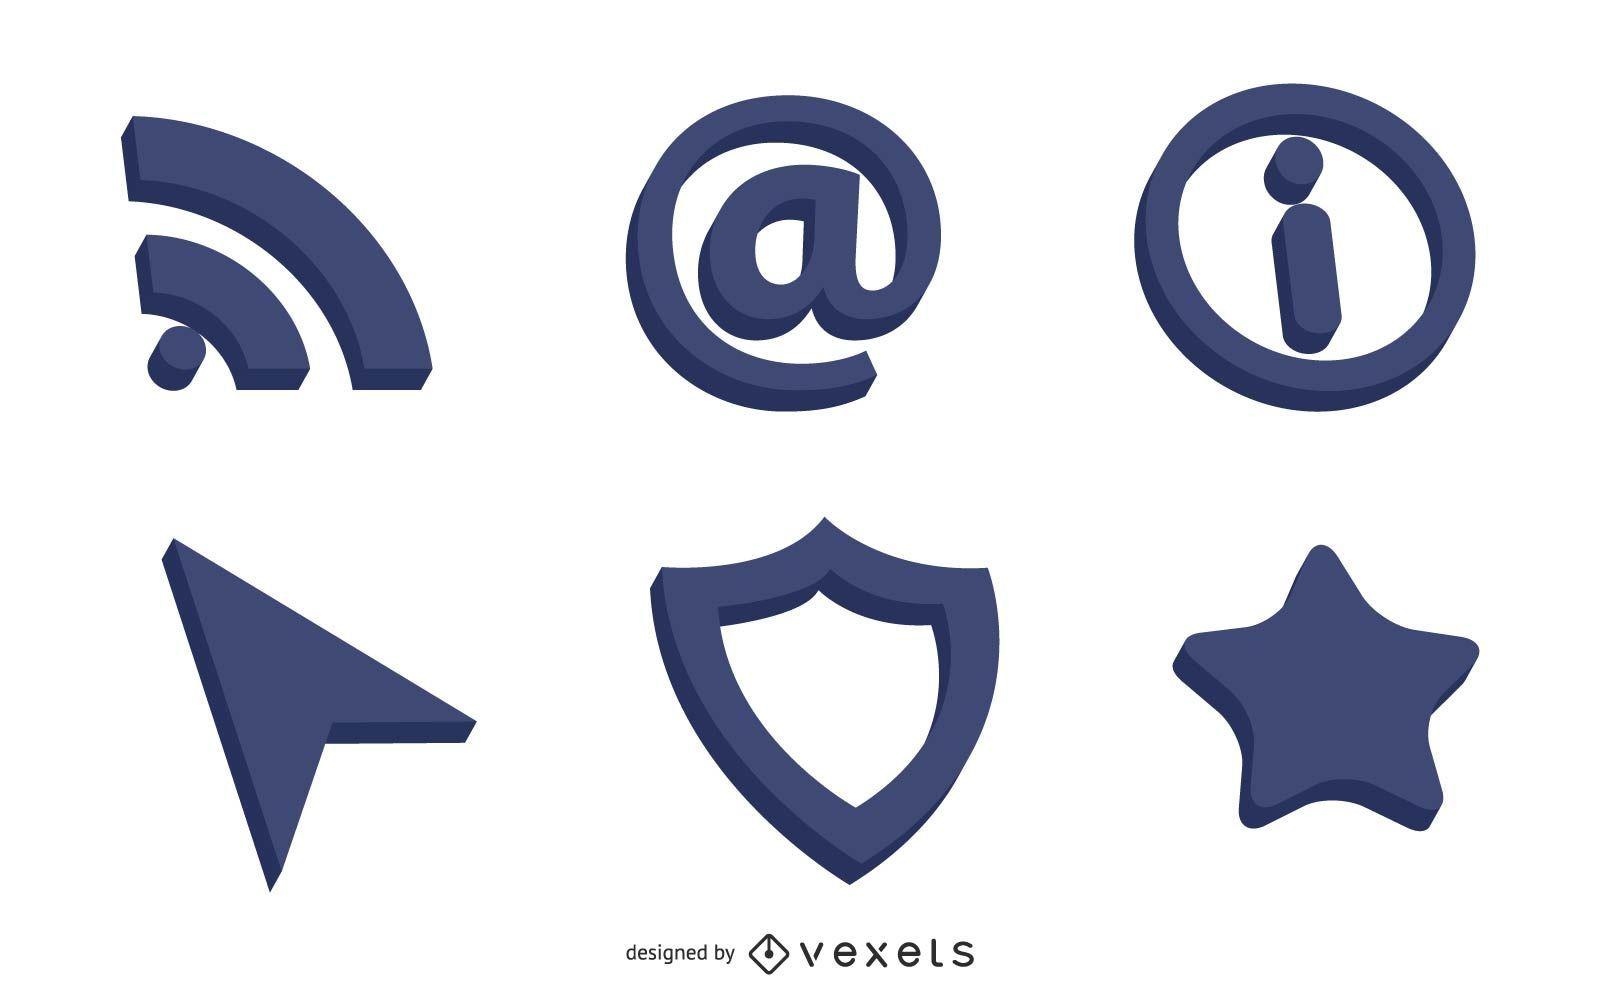 Iconos Web 3D